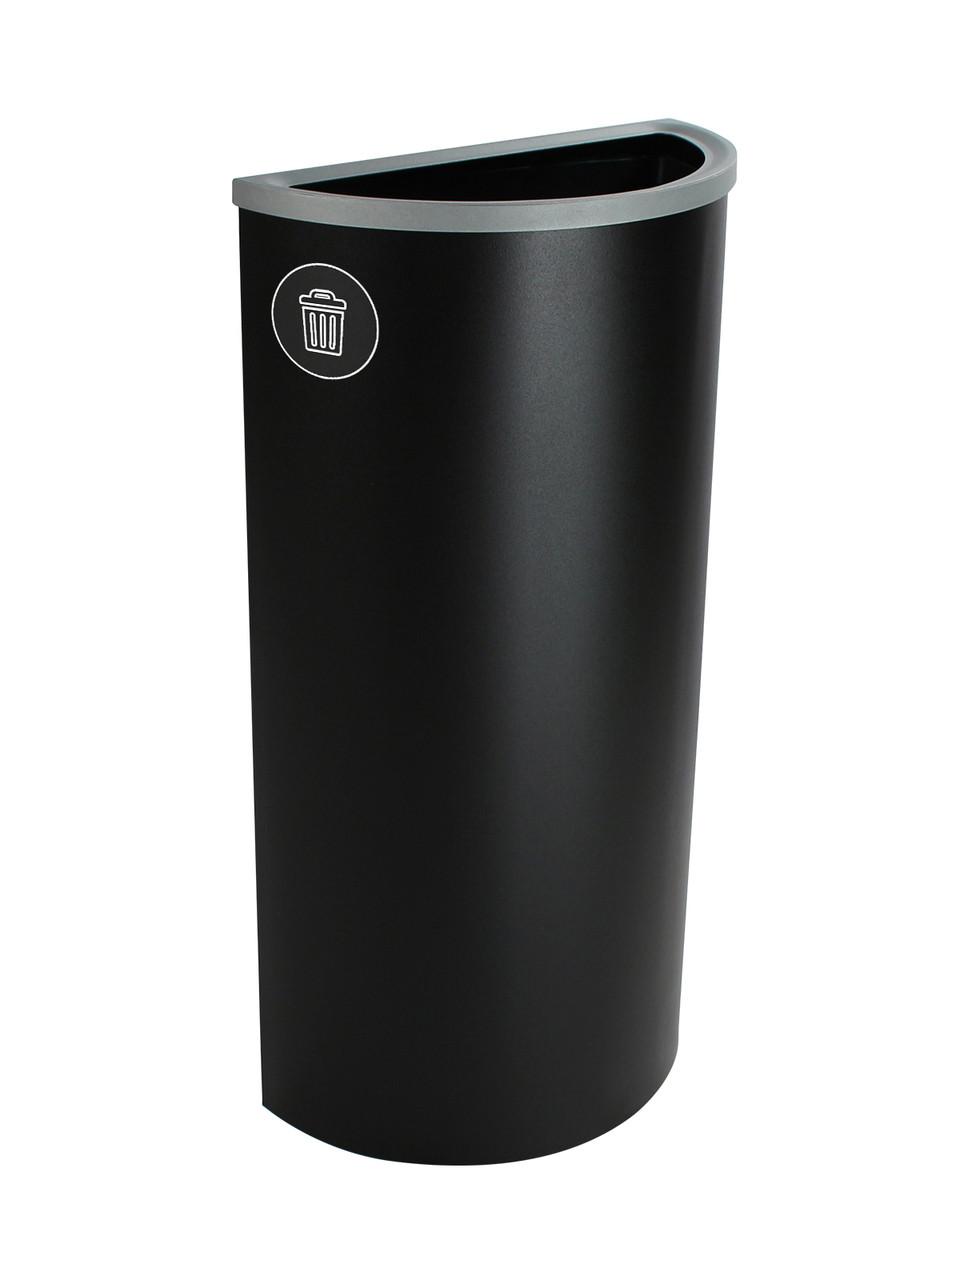 8 Gallon Steel Spectrum Half Round Trash Can Black 8107030-4